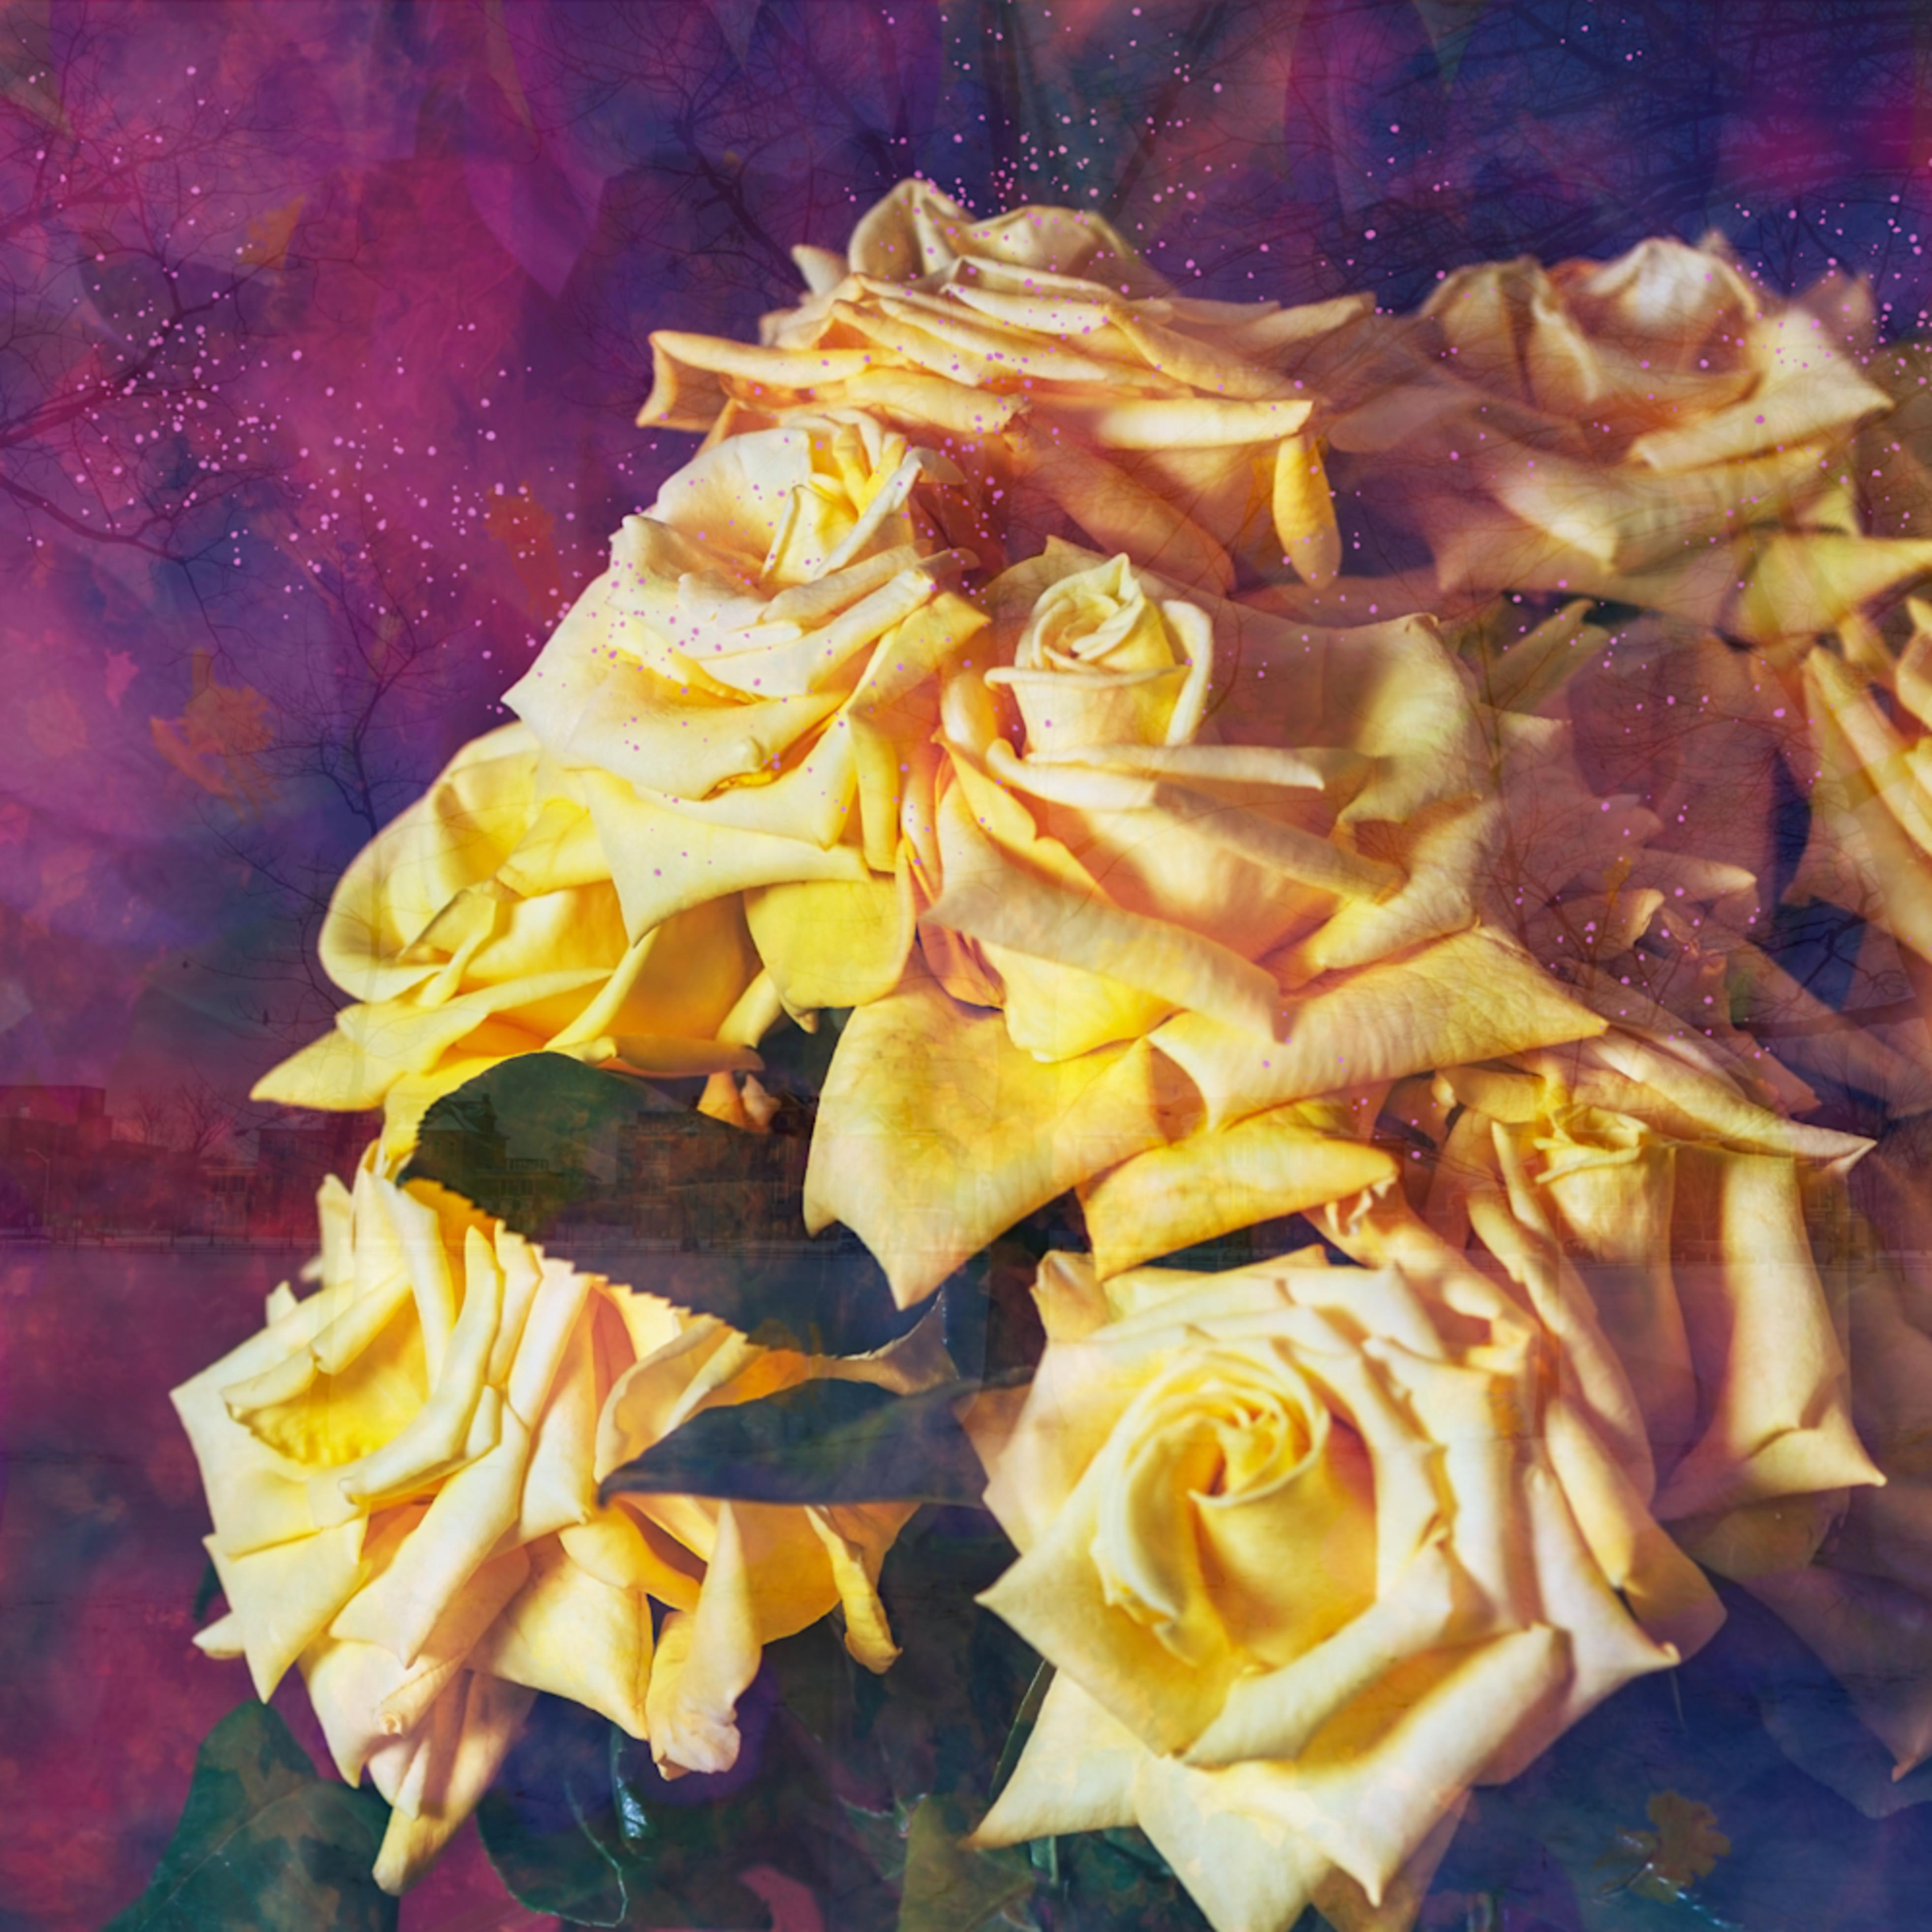 Yellow rose 0003compfv2 wadwmu